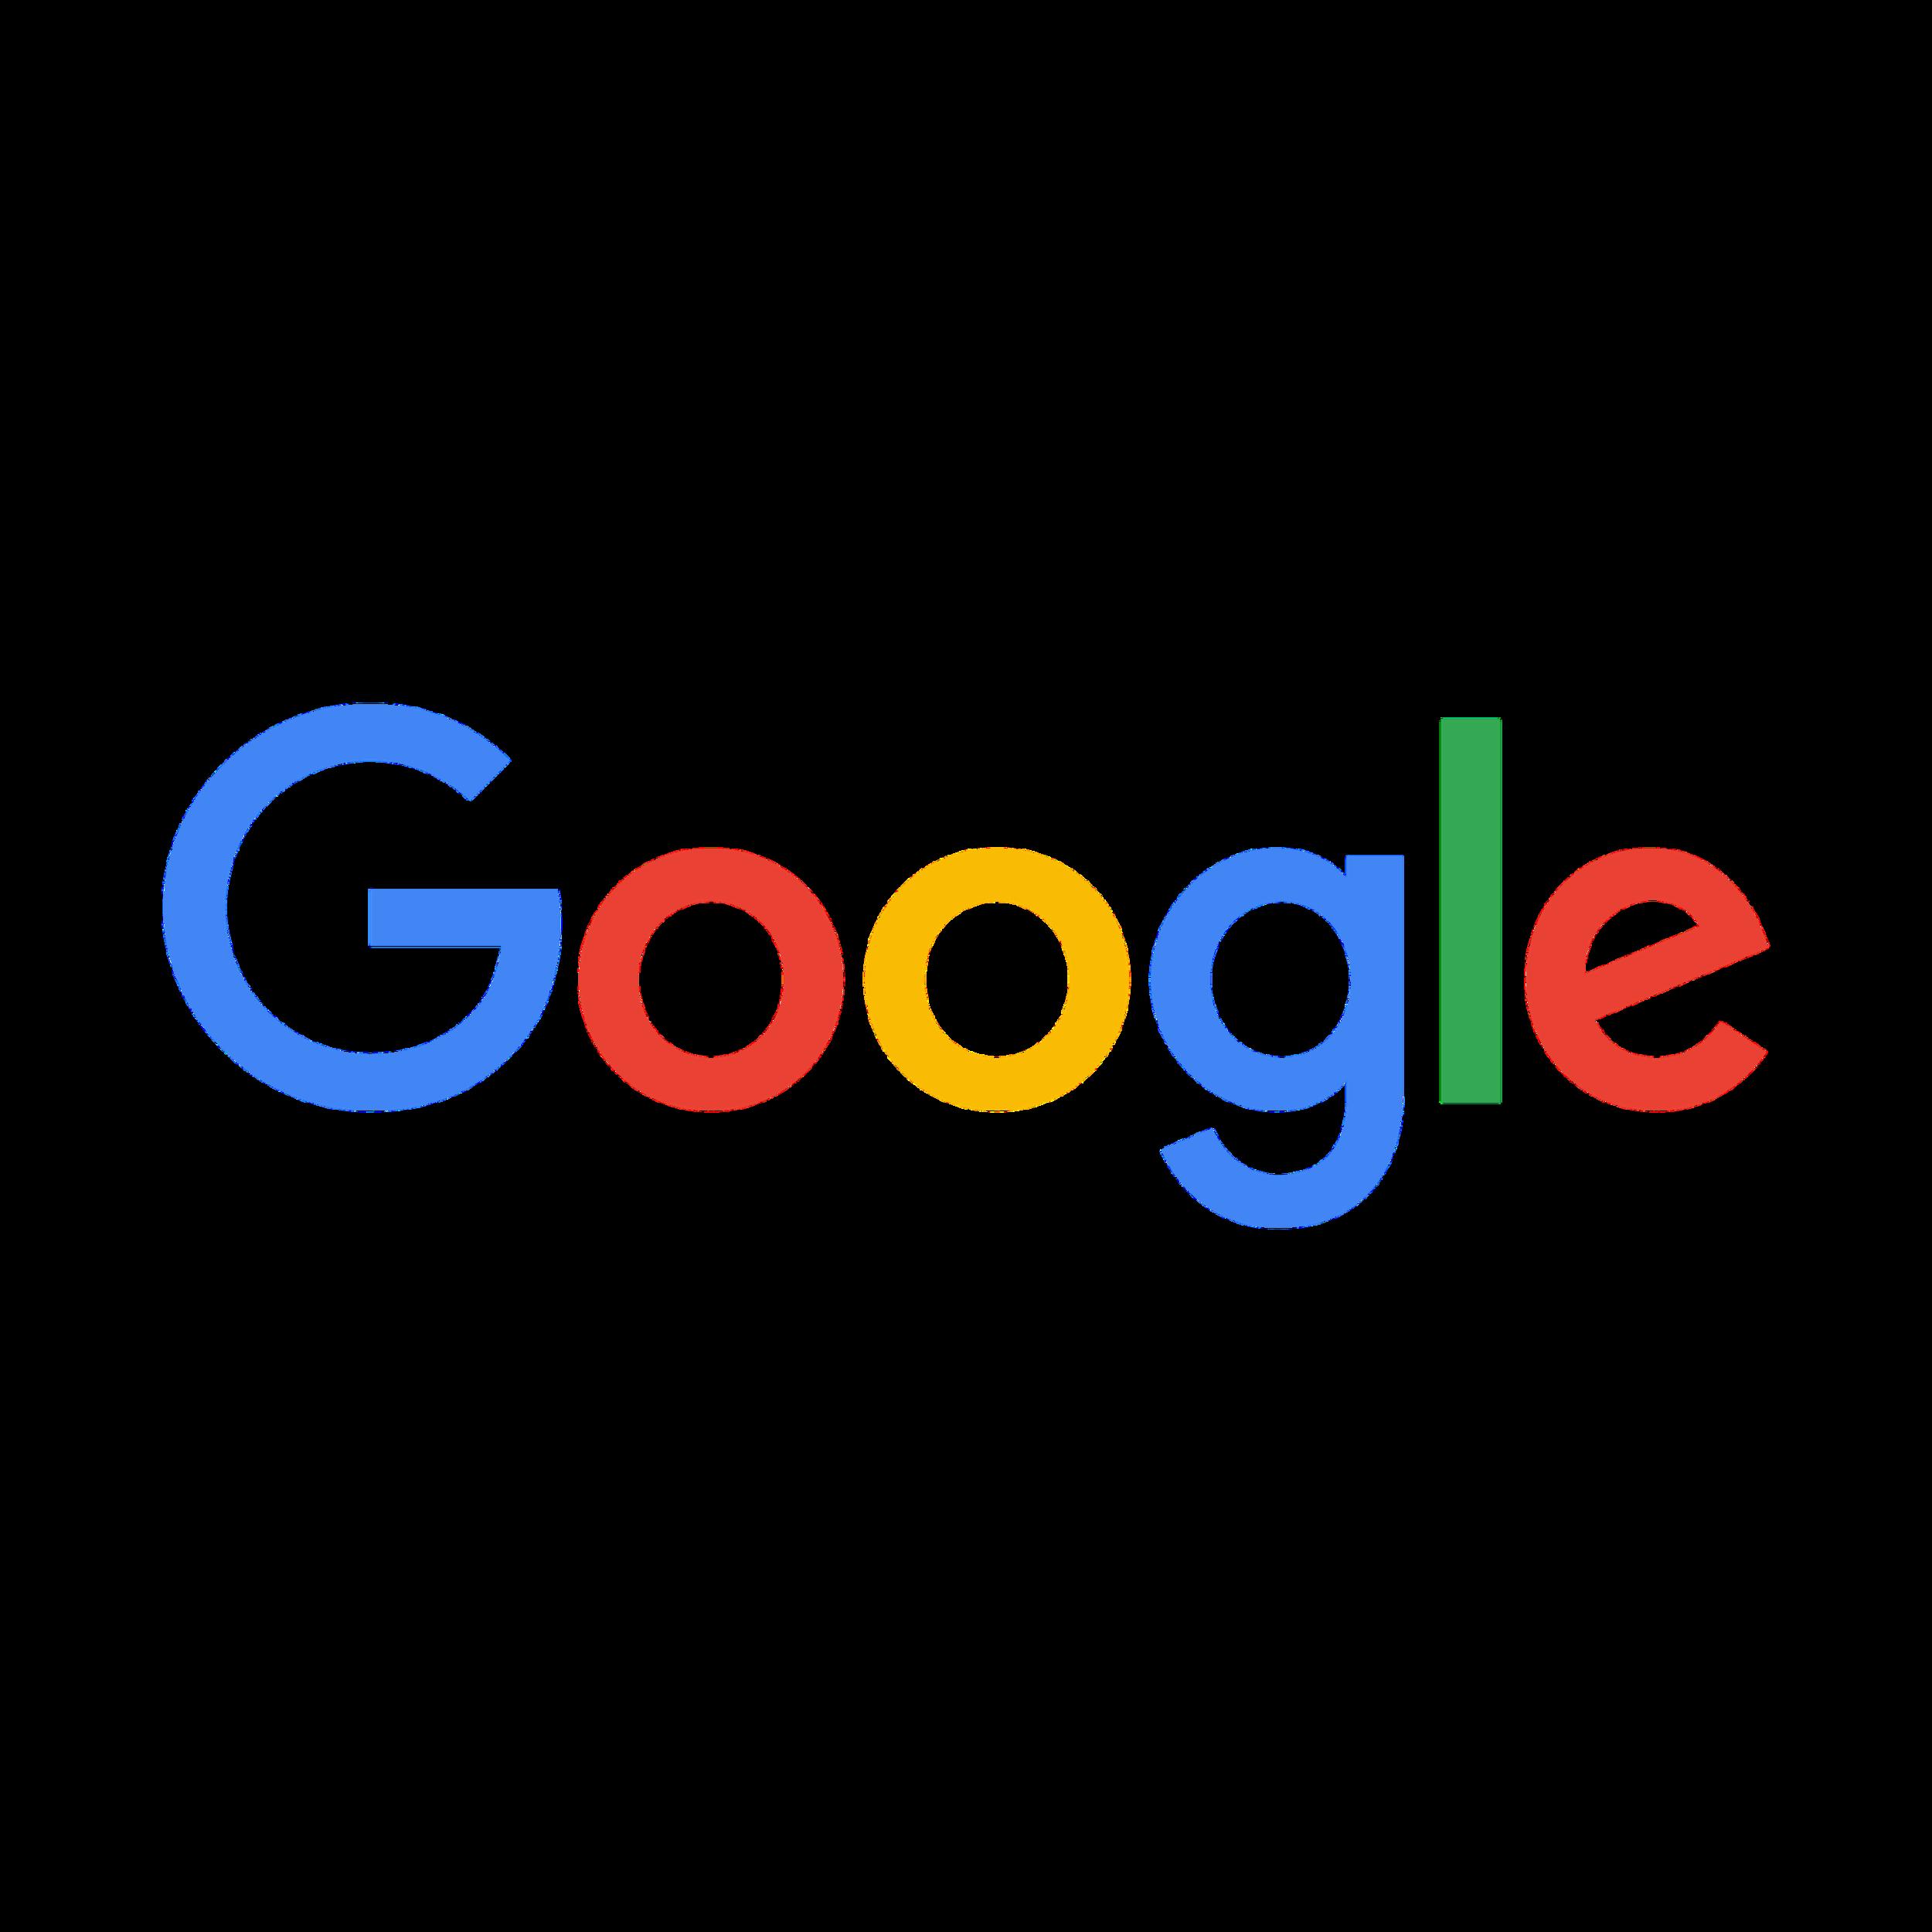 Google_FullColor_3x_830x271px.max-2800x2800.png